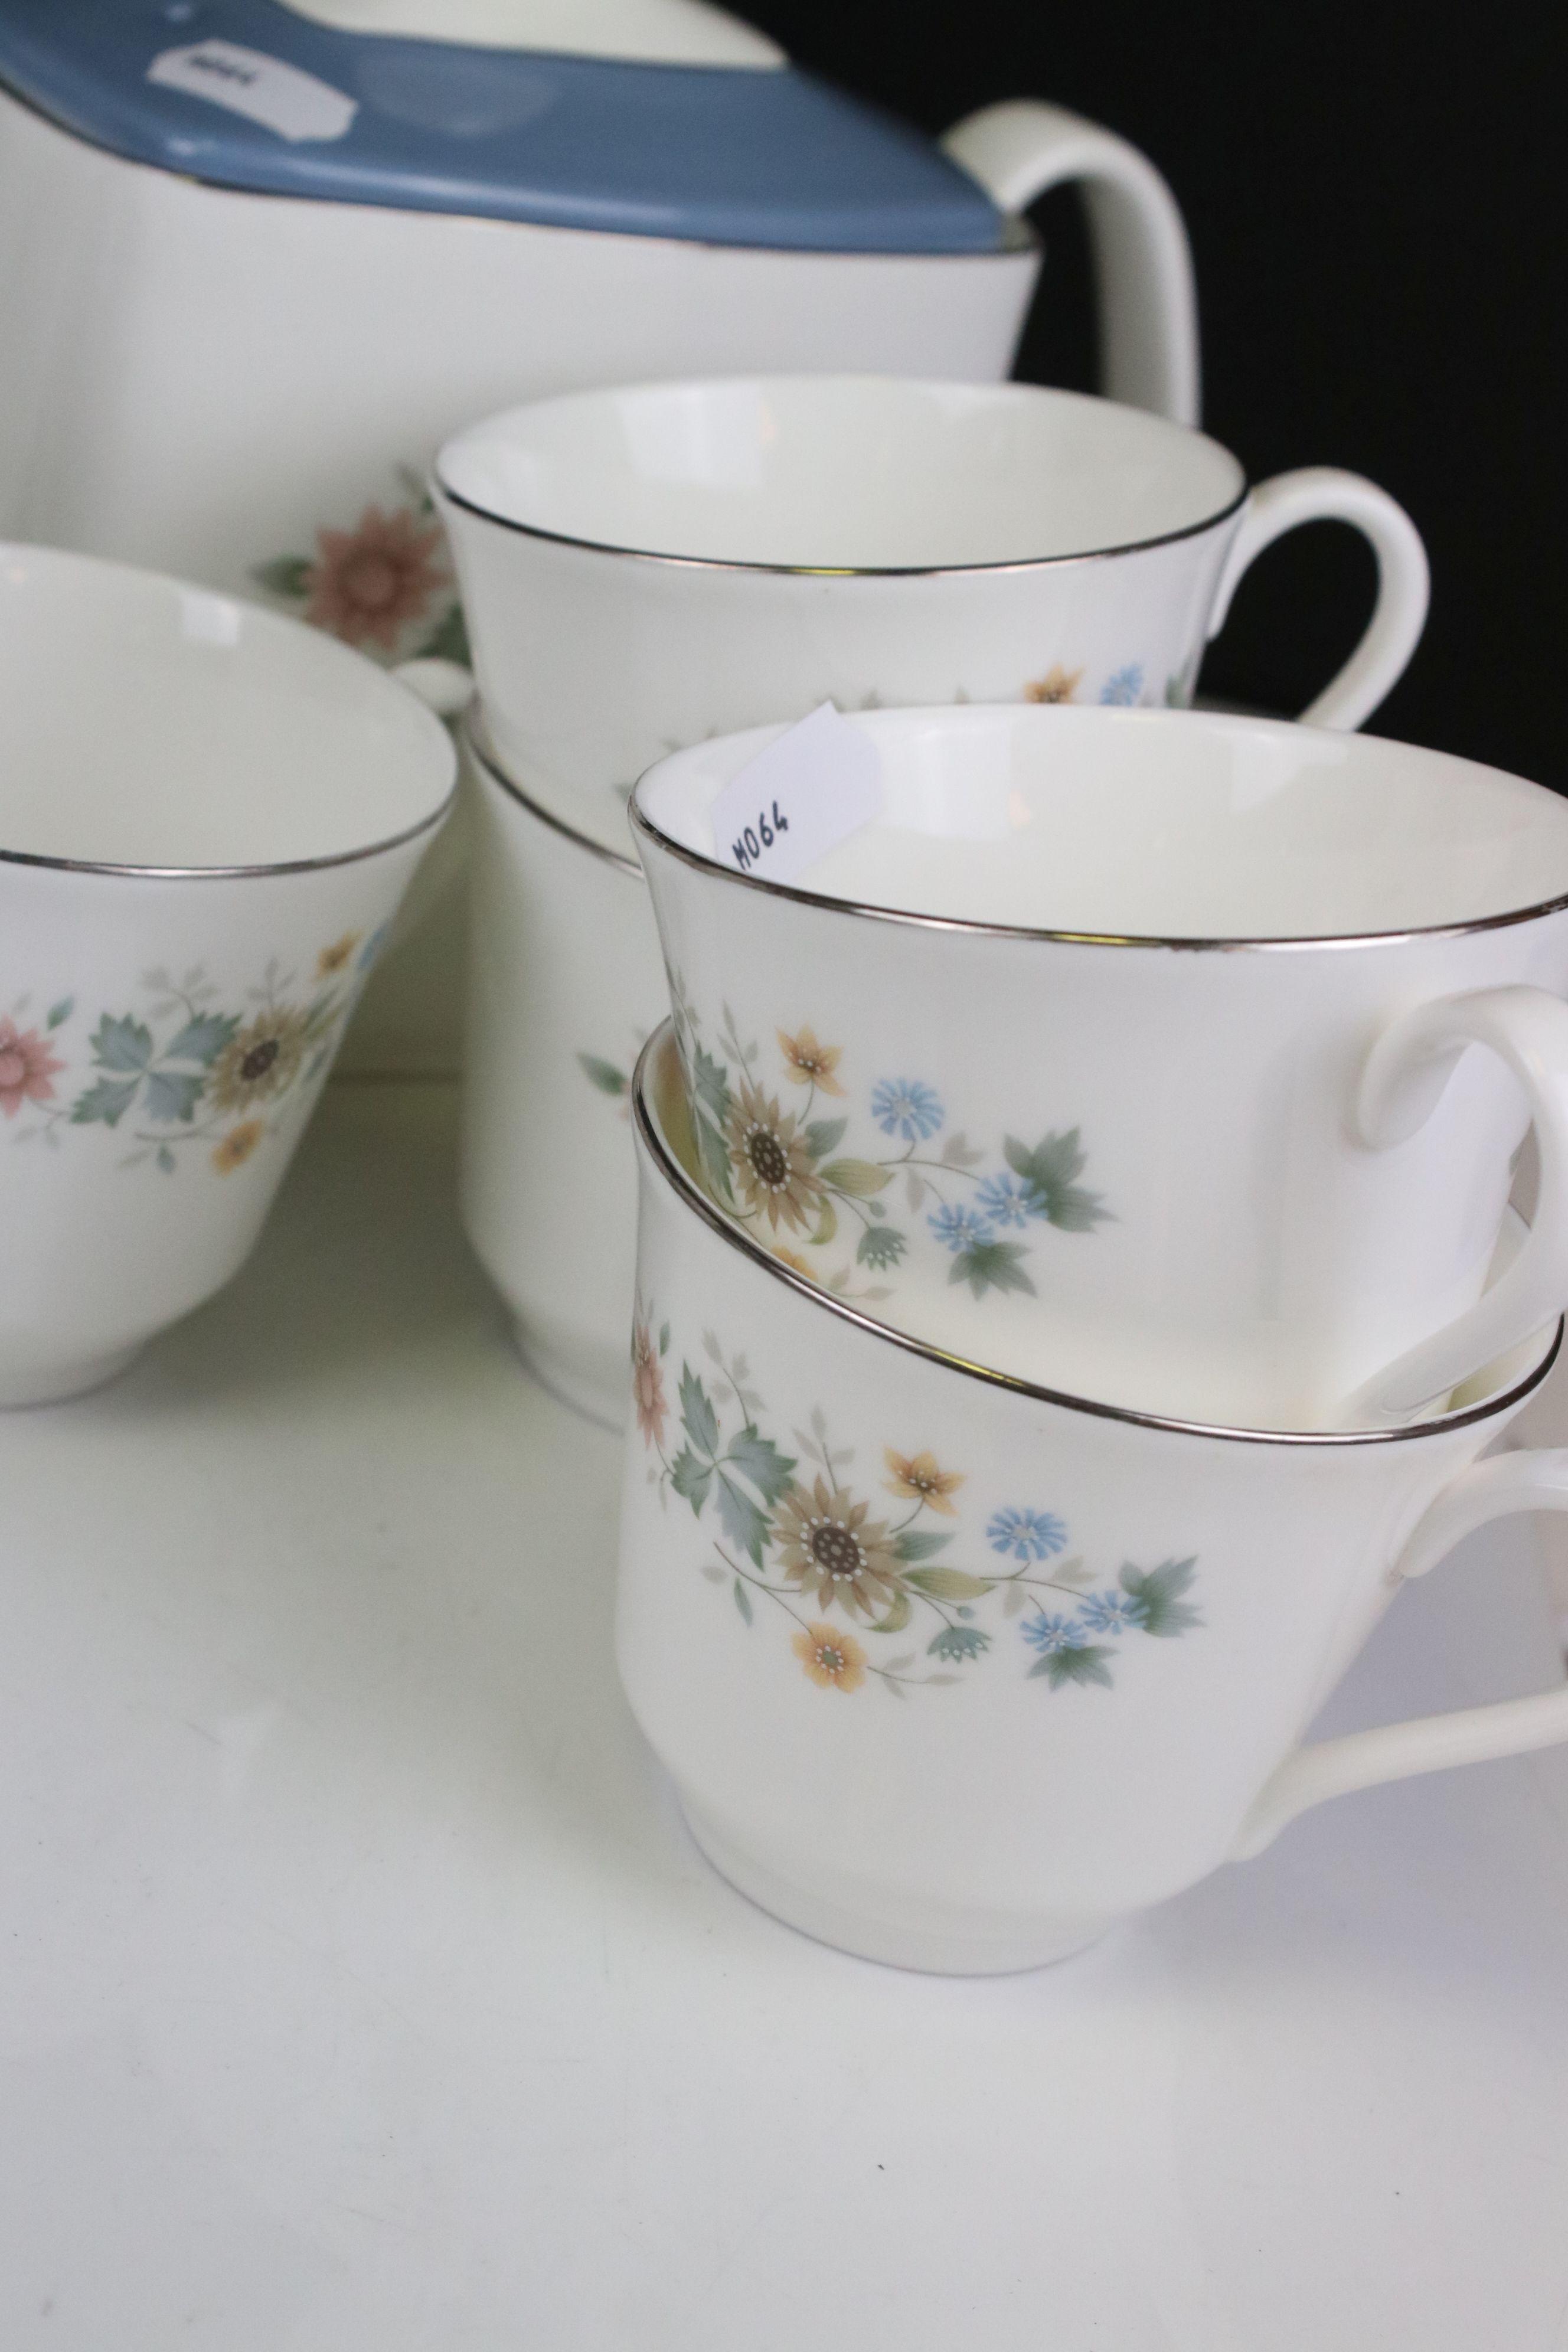 Royal Doulton ' Pastorale ' Tea Set comprising Two Teapots, Milk, Sugar, 6 Cups and 7 Saucers - Image 4 of 7